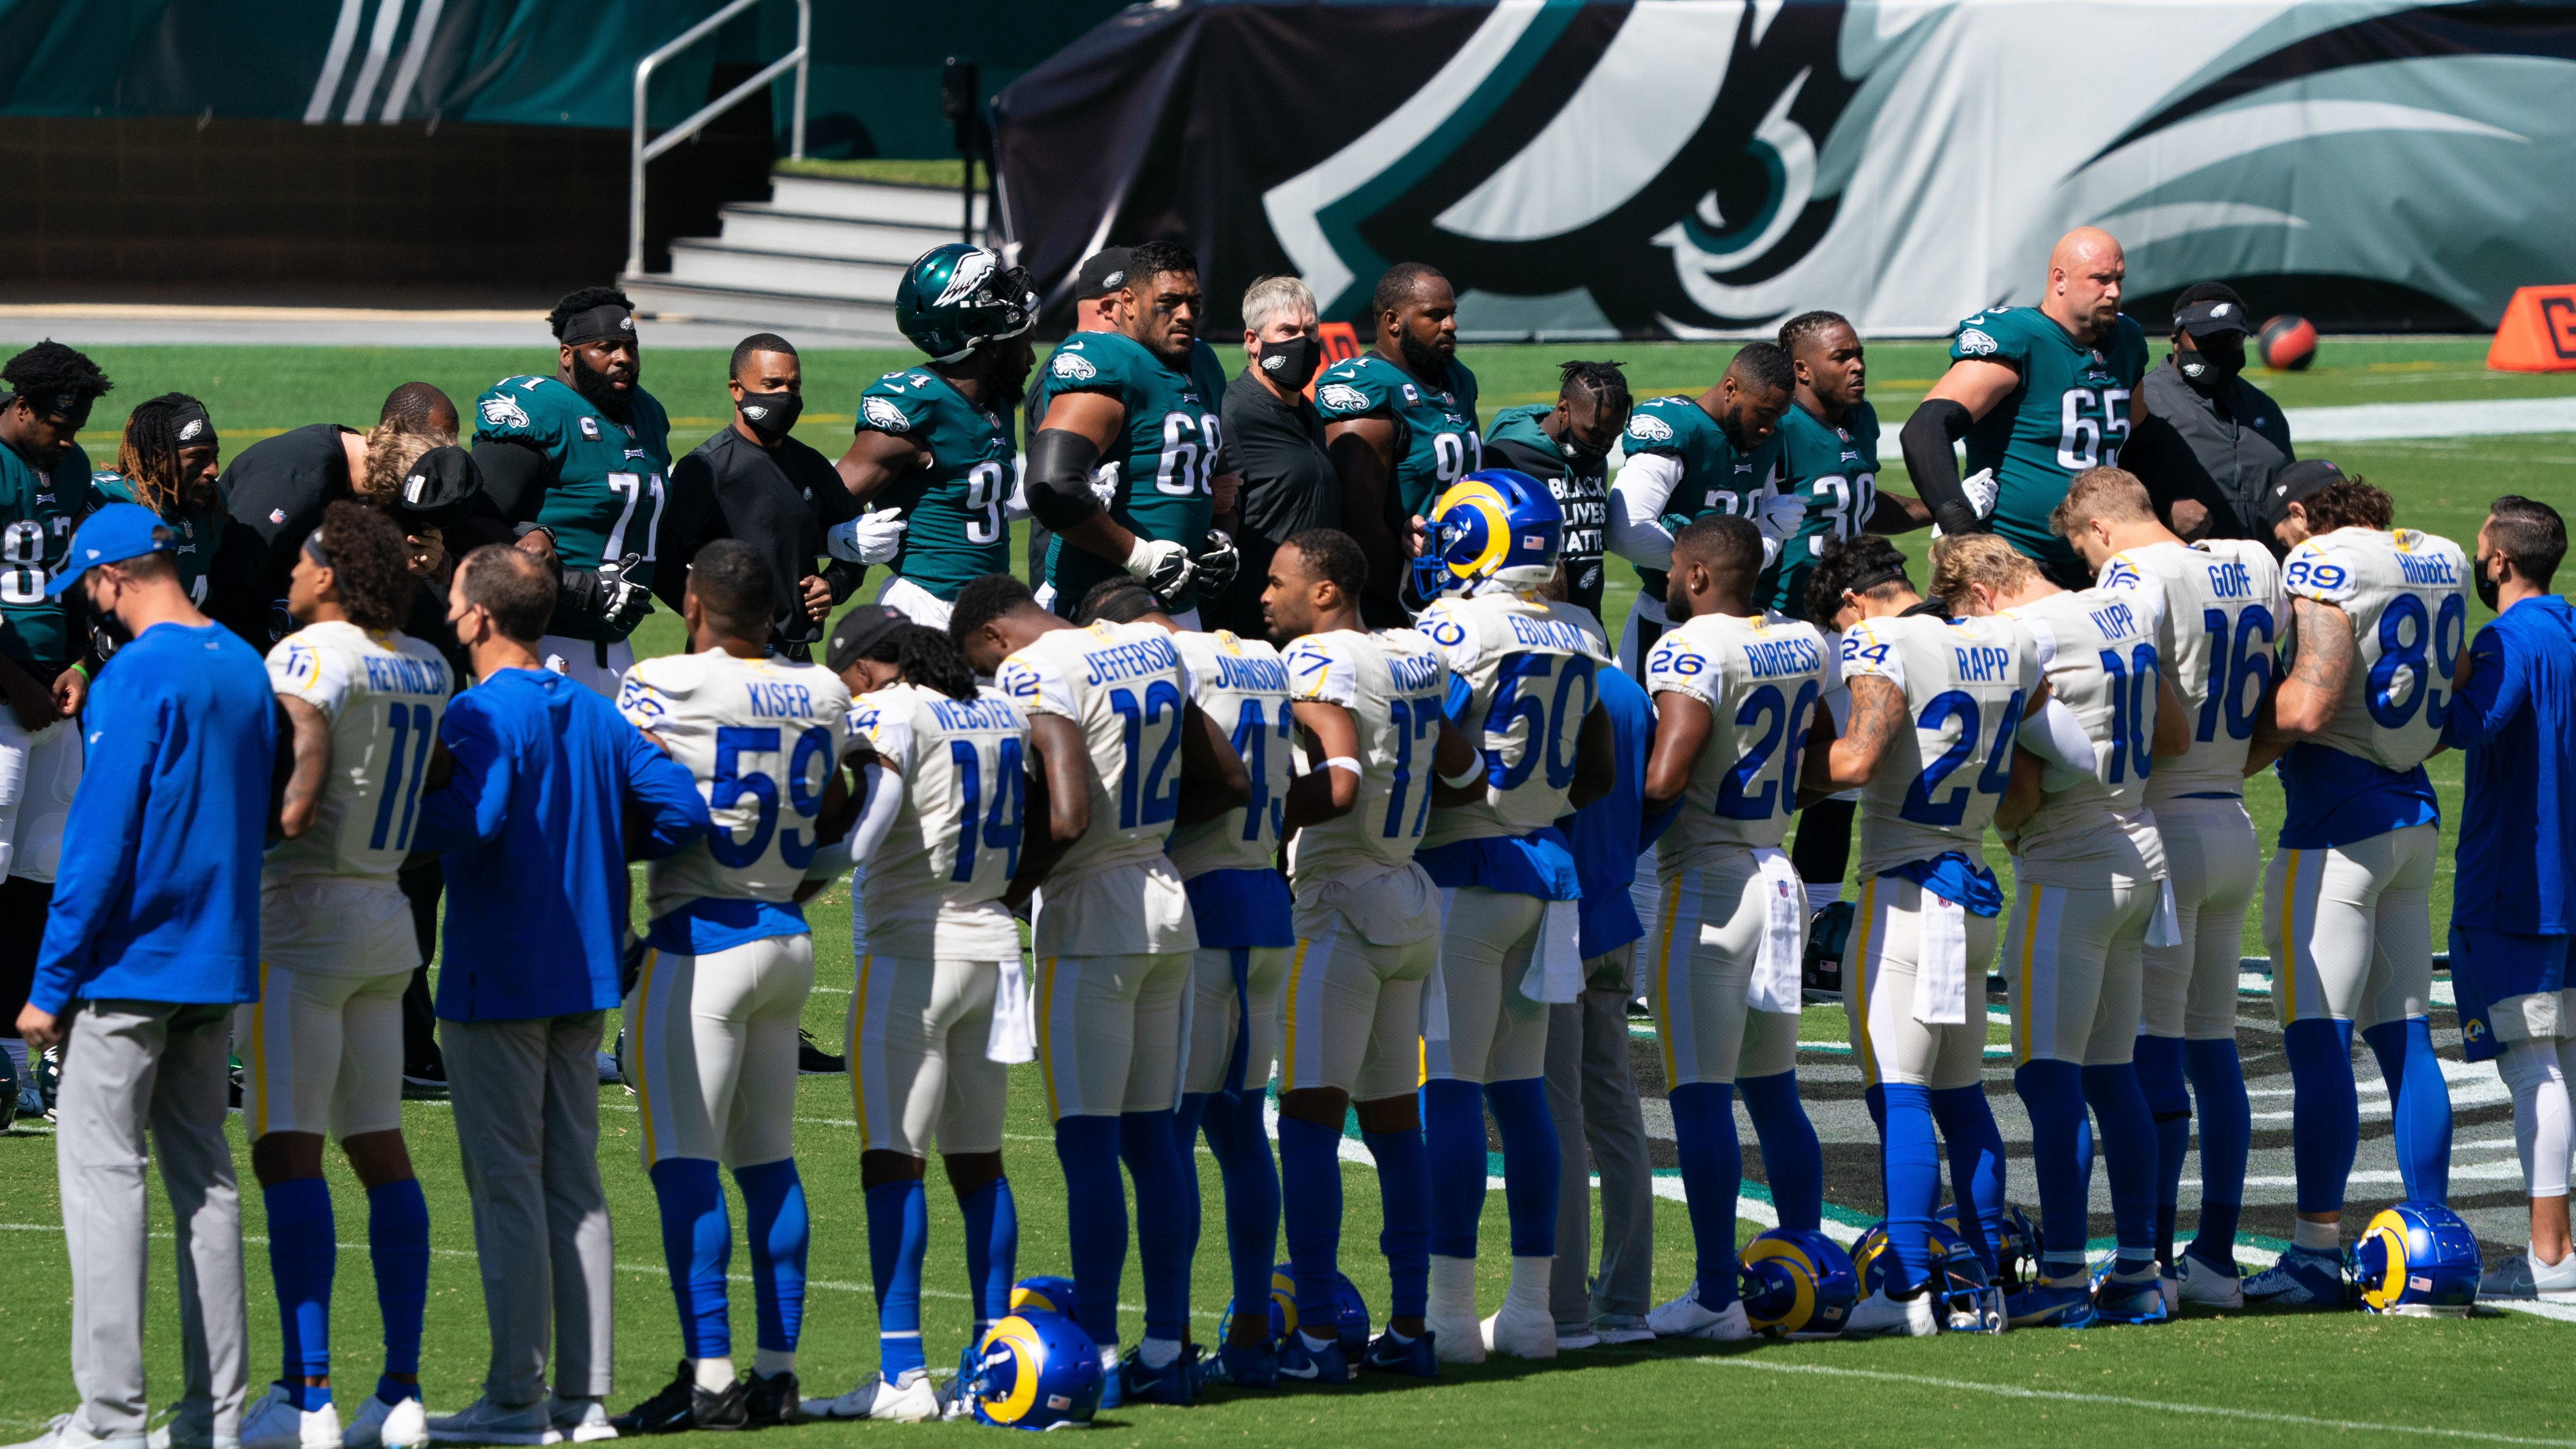 Around 20 Eagles demonstrate during national anthem in Week 2